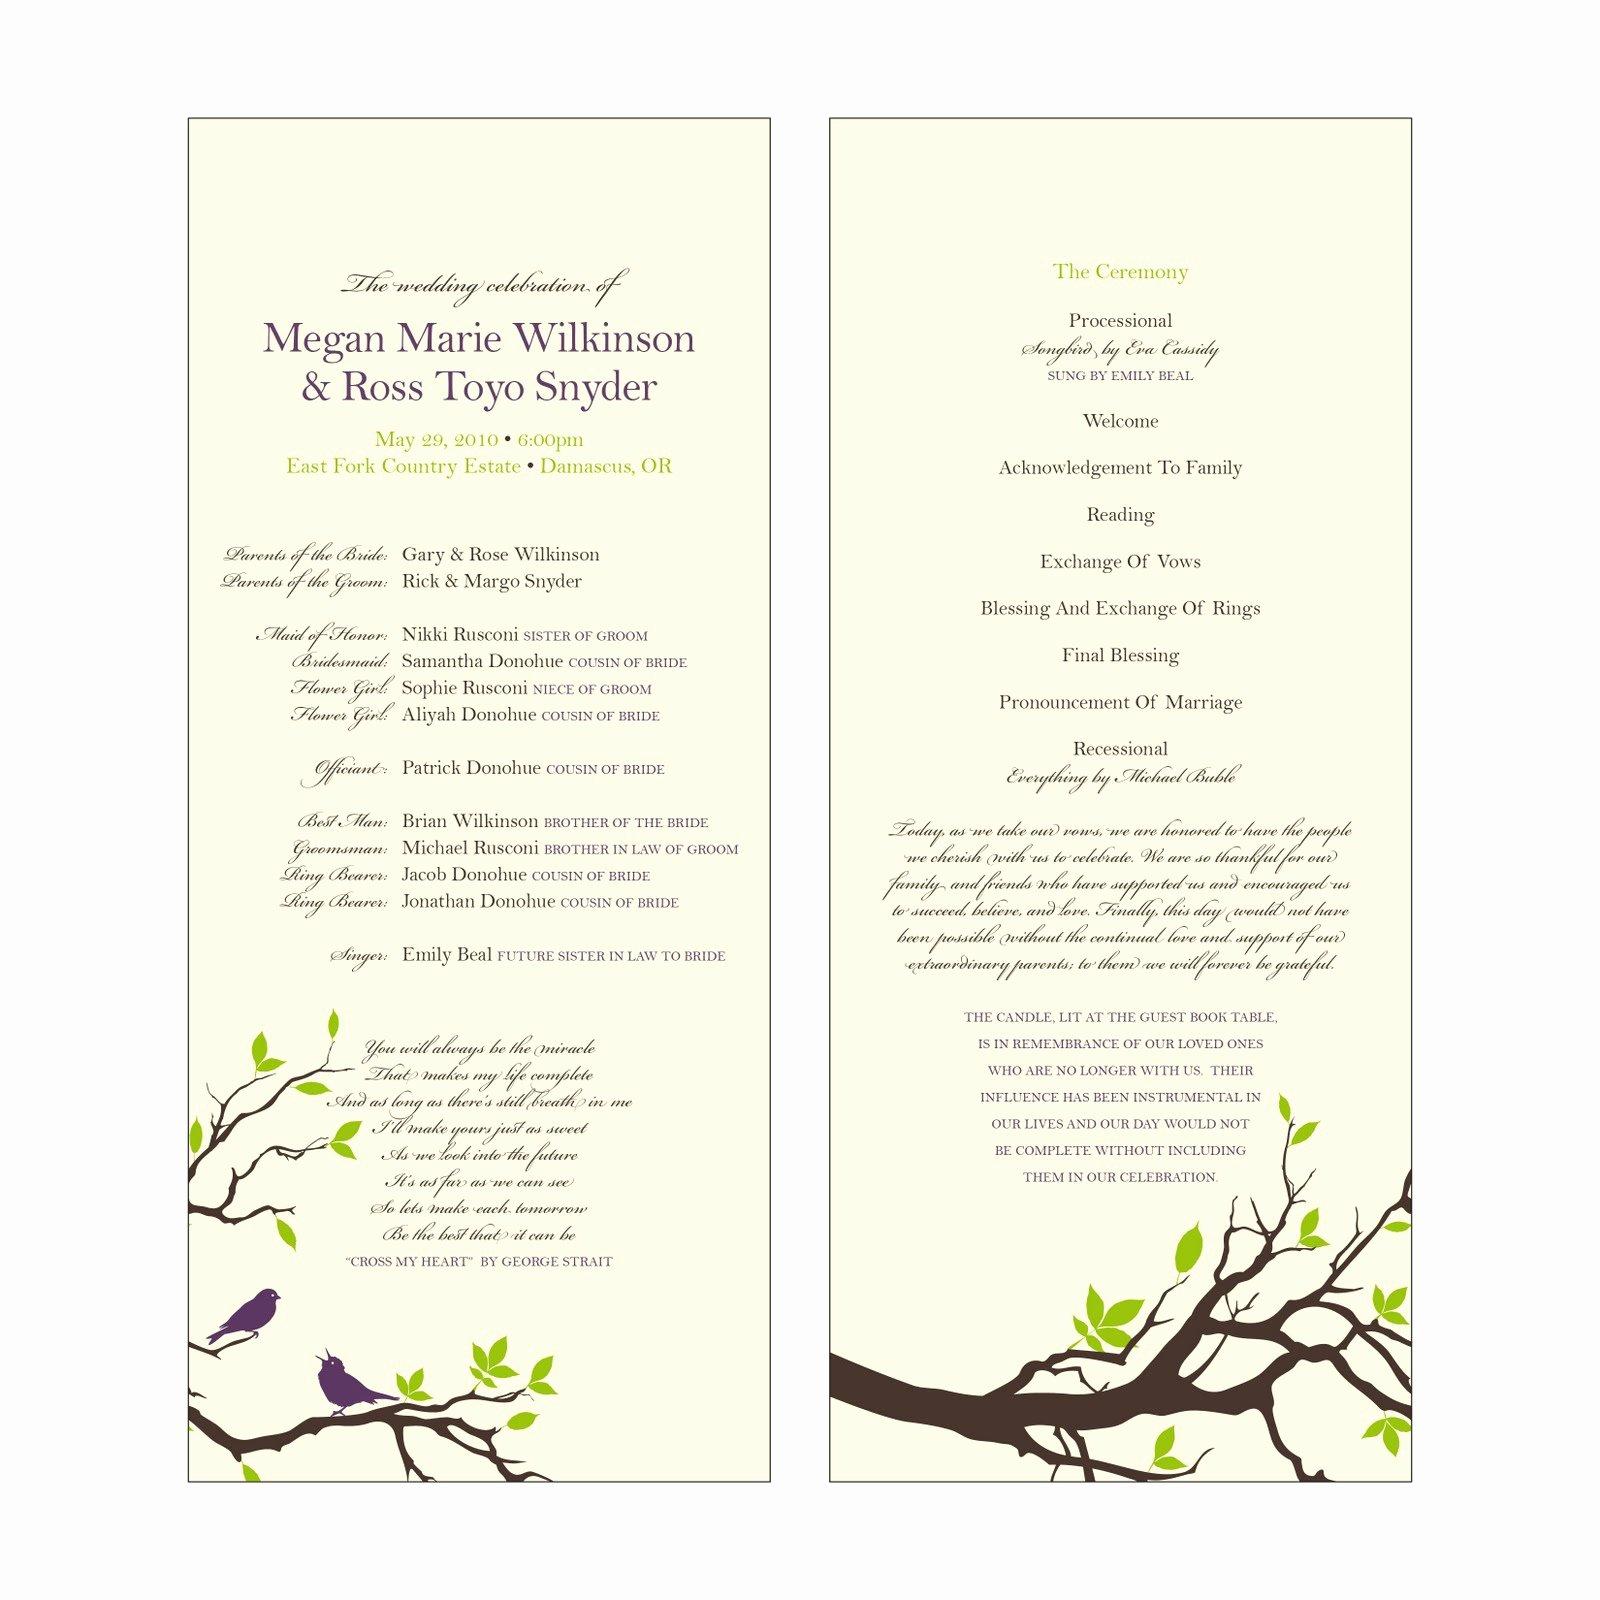 Catholic Wedding Program Templates Free Unique Lameeka S Blog Catholic Wedding Programs